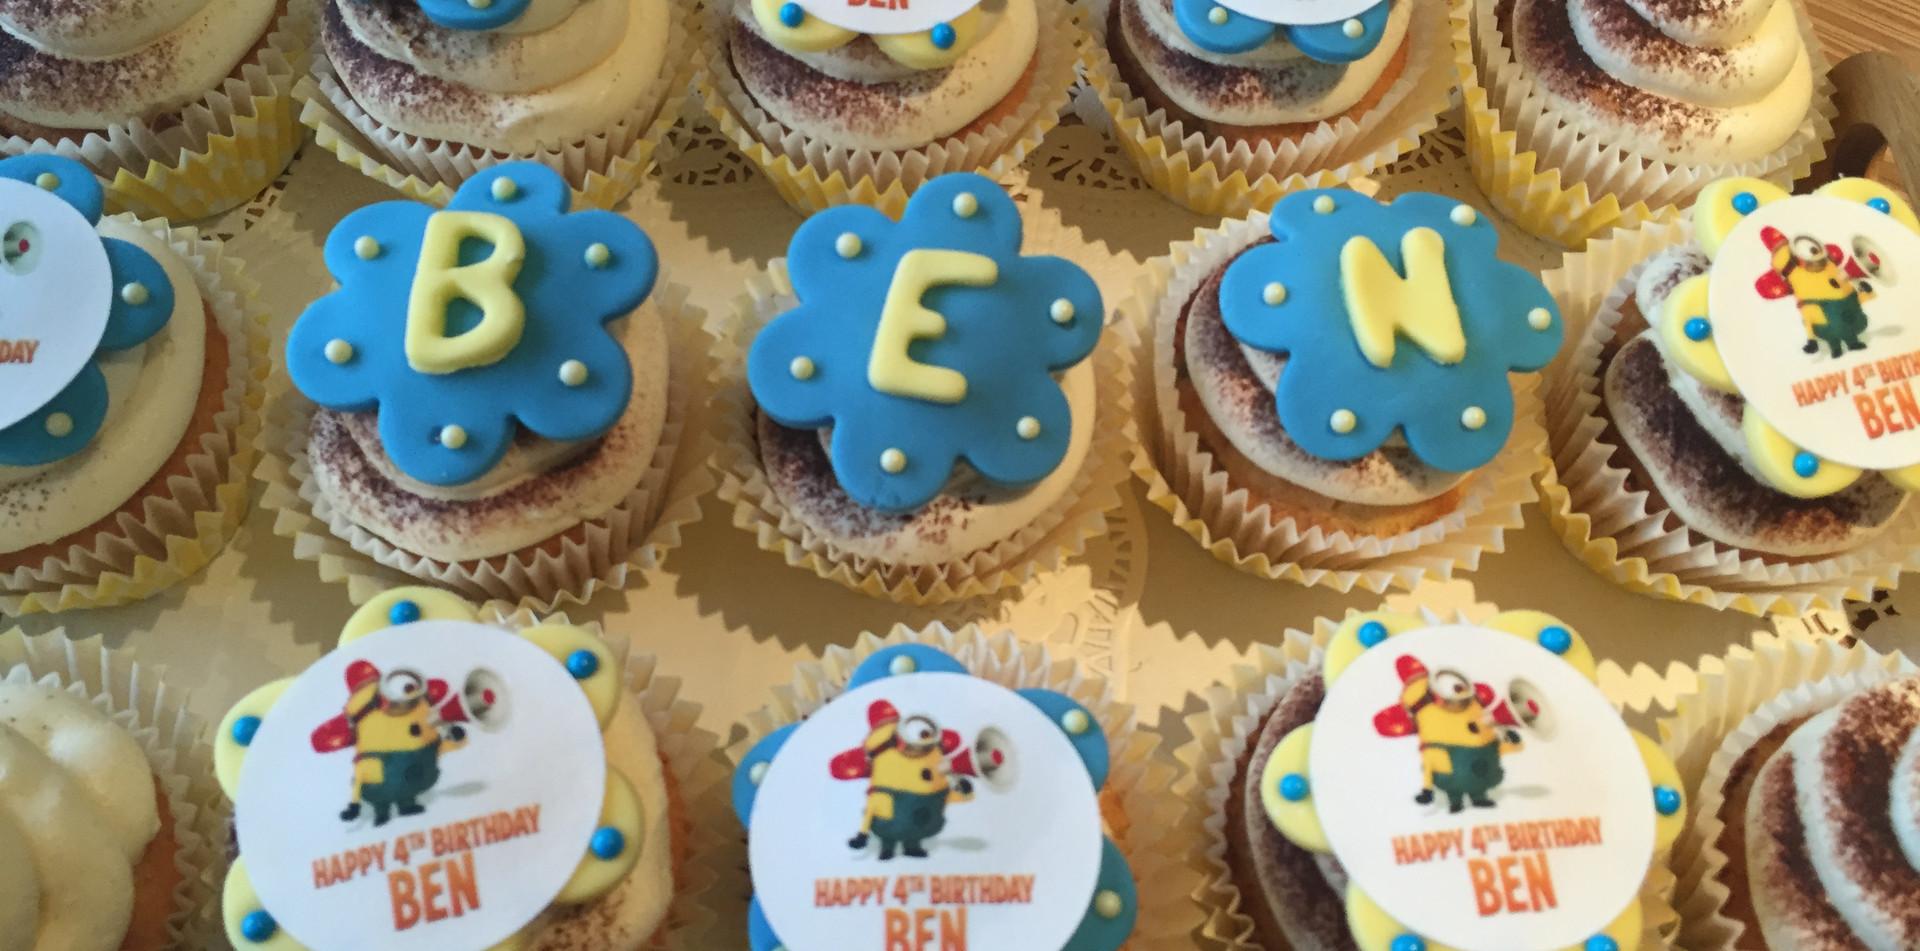 Minion themed cupcakes